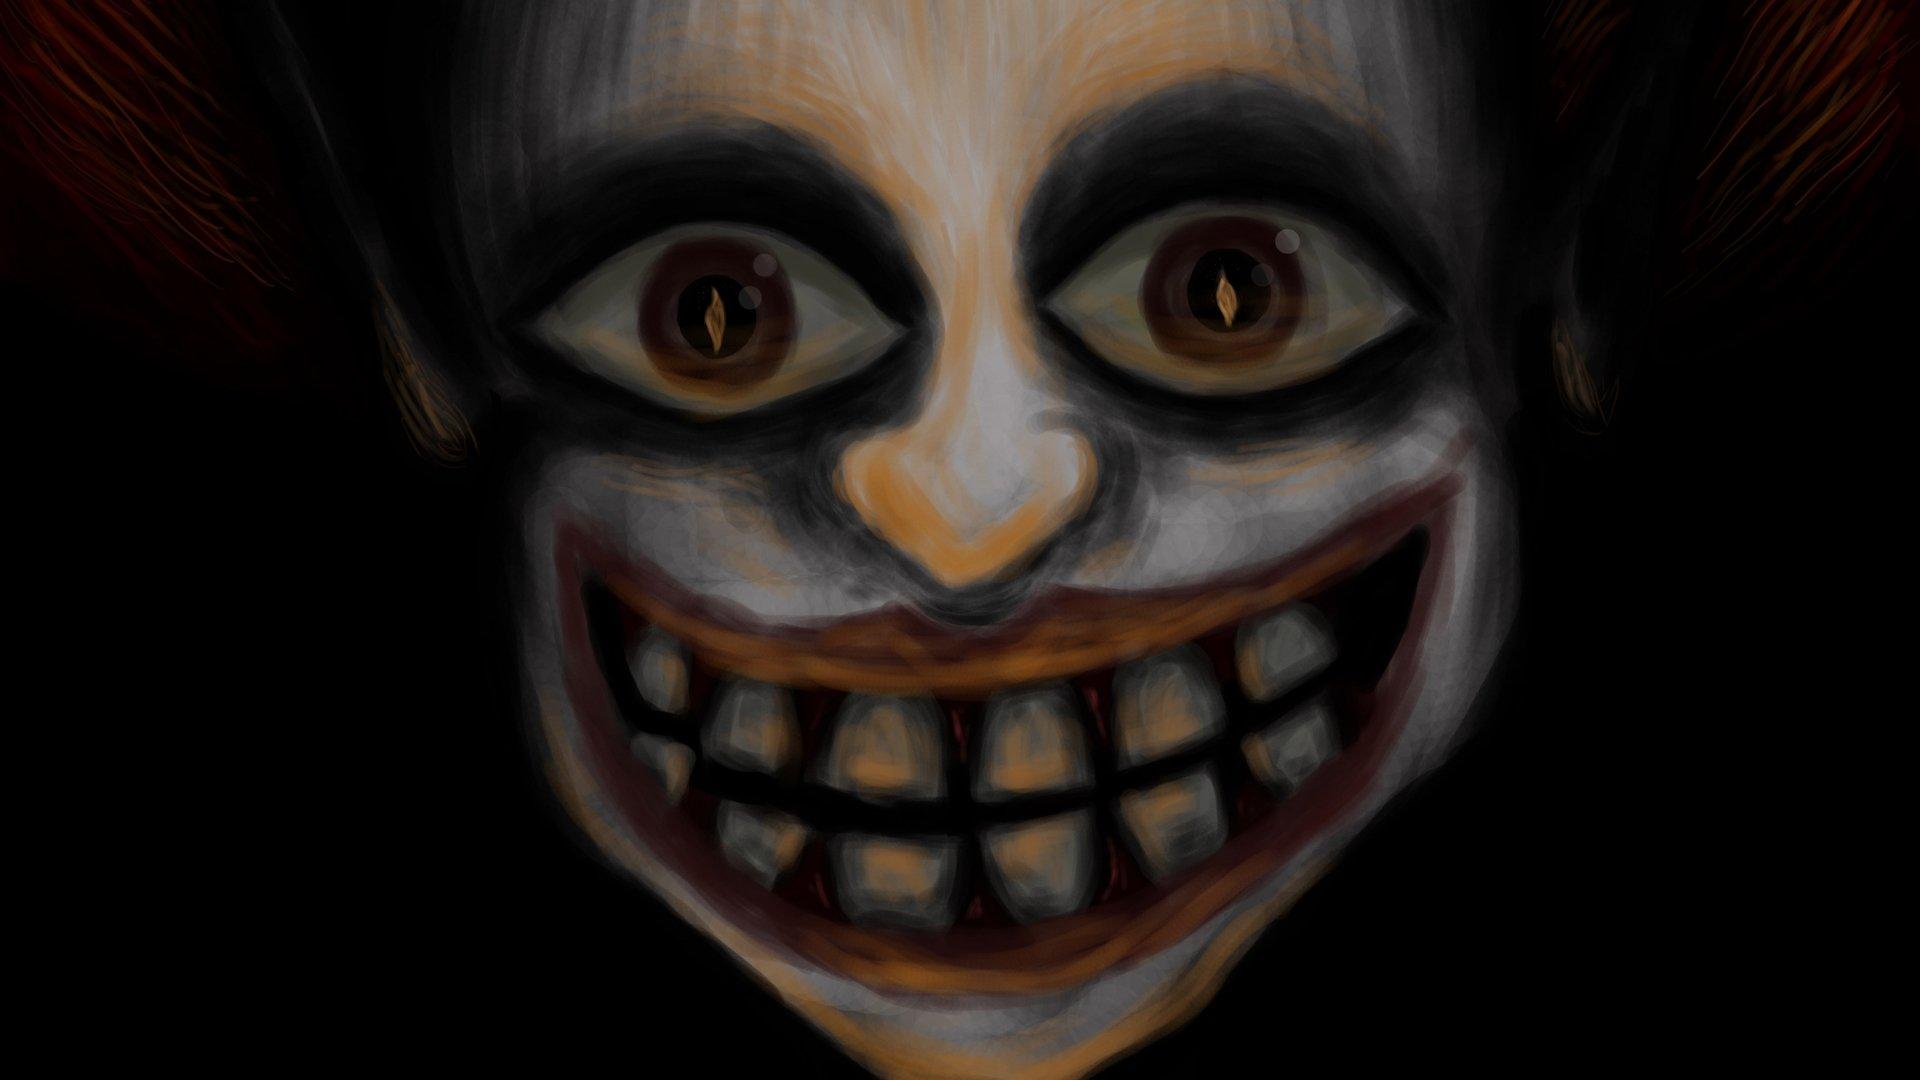 Dark - Clown  Creepy Jeff The Killer Wallpaper